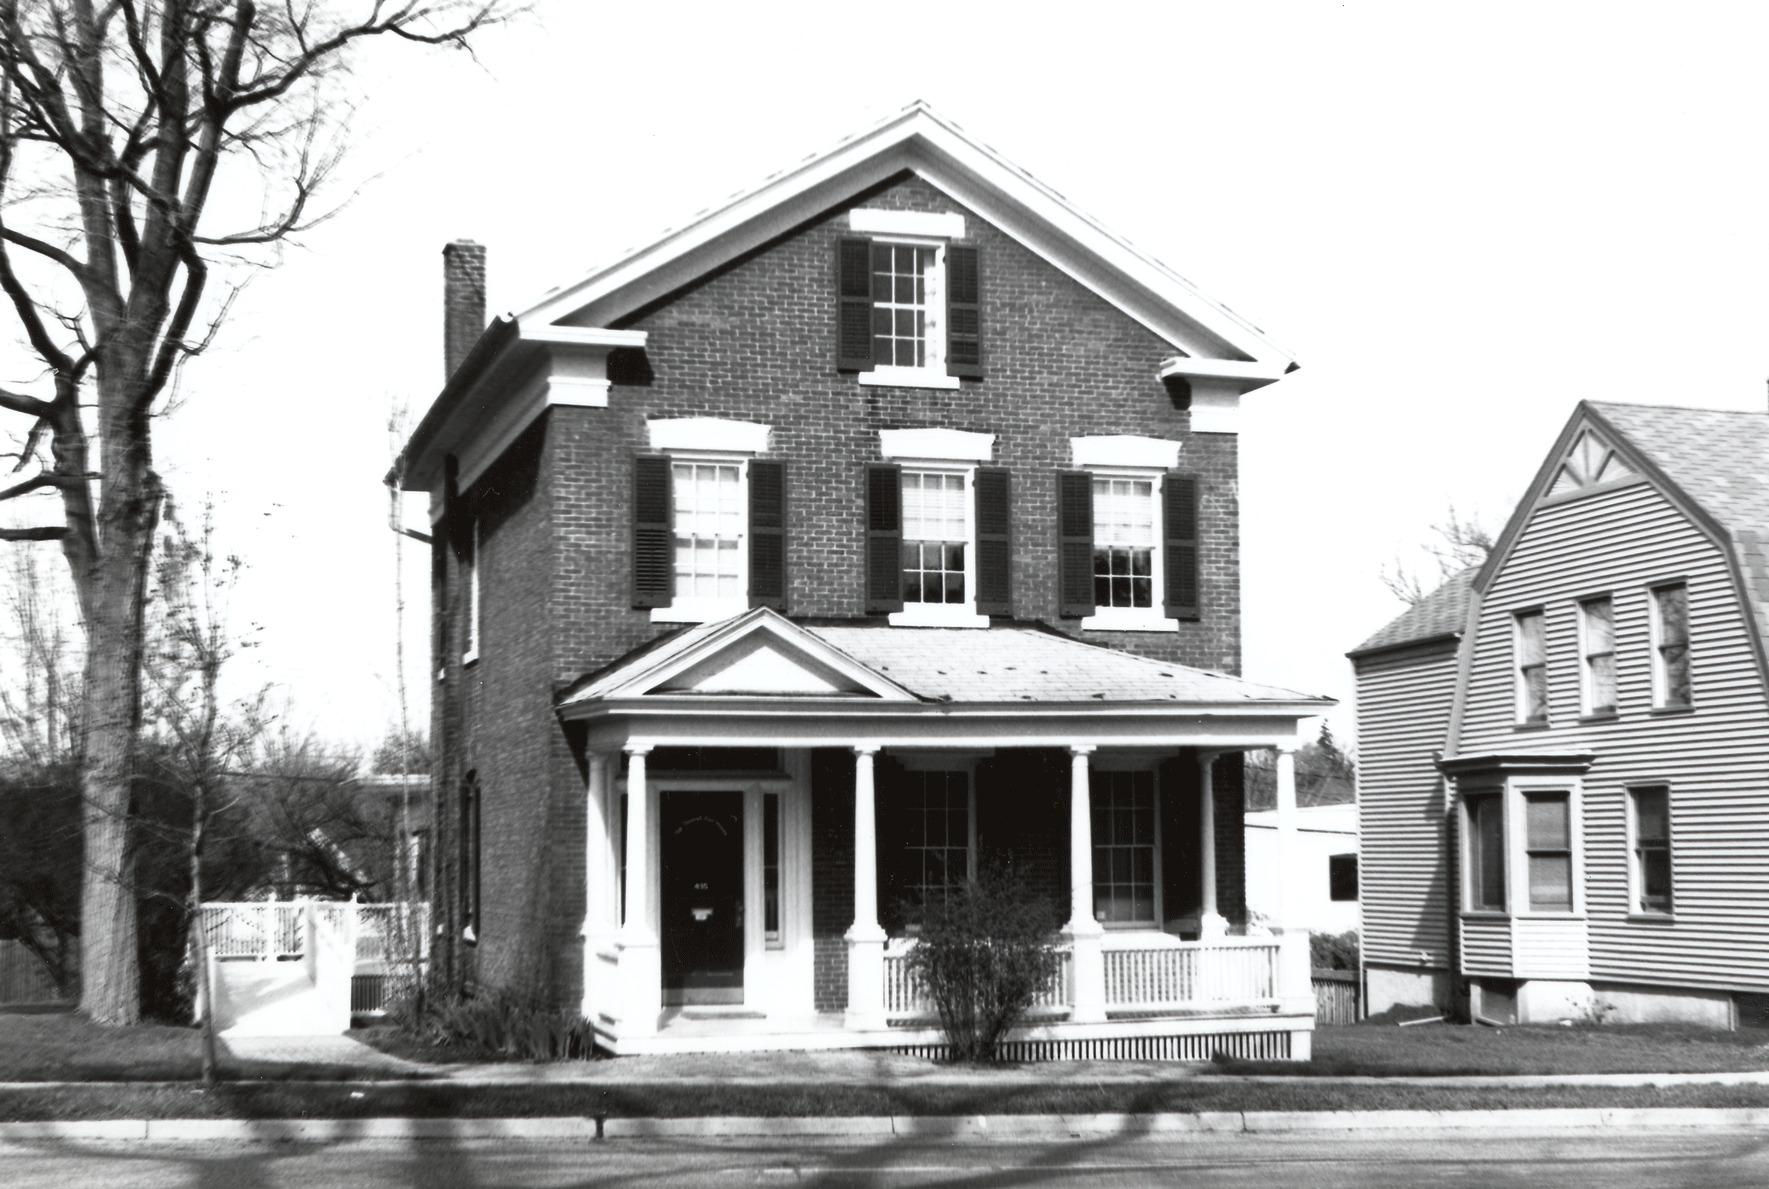 thomas earl house 1860 ann arbor district library rh aadl org 1860 house for sale uk 1860 house paint colors